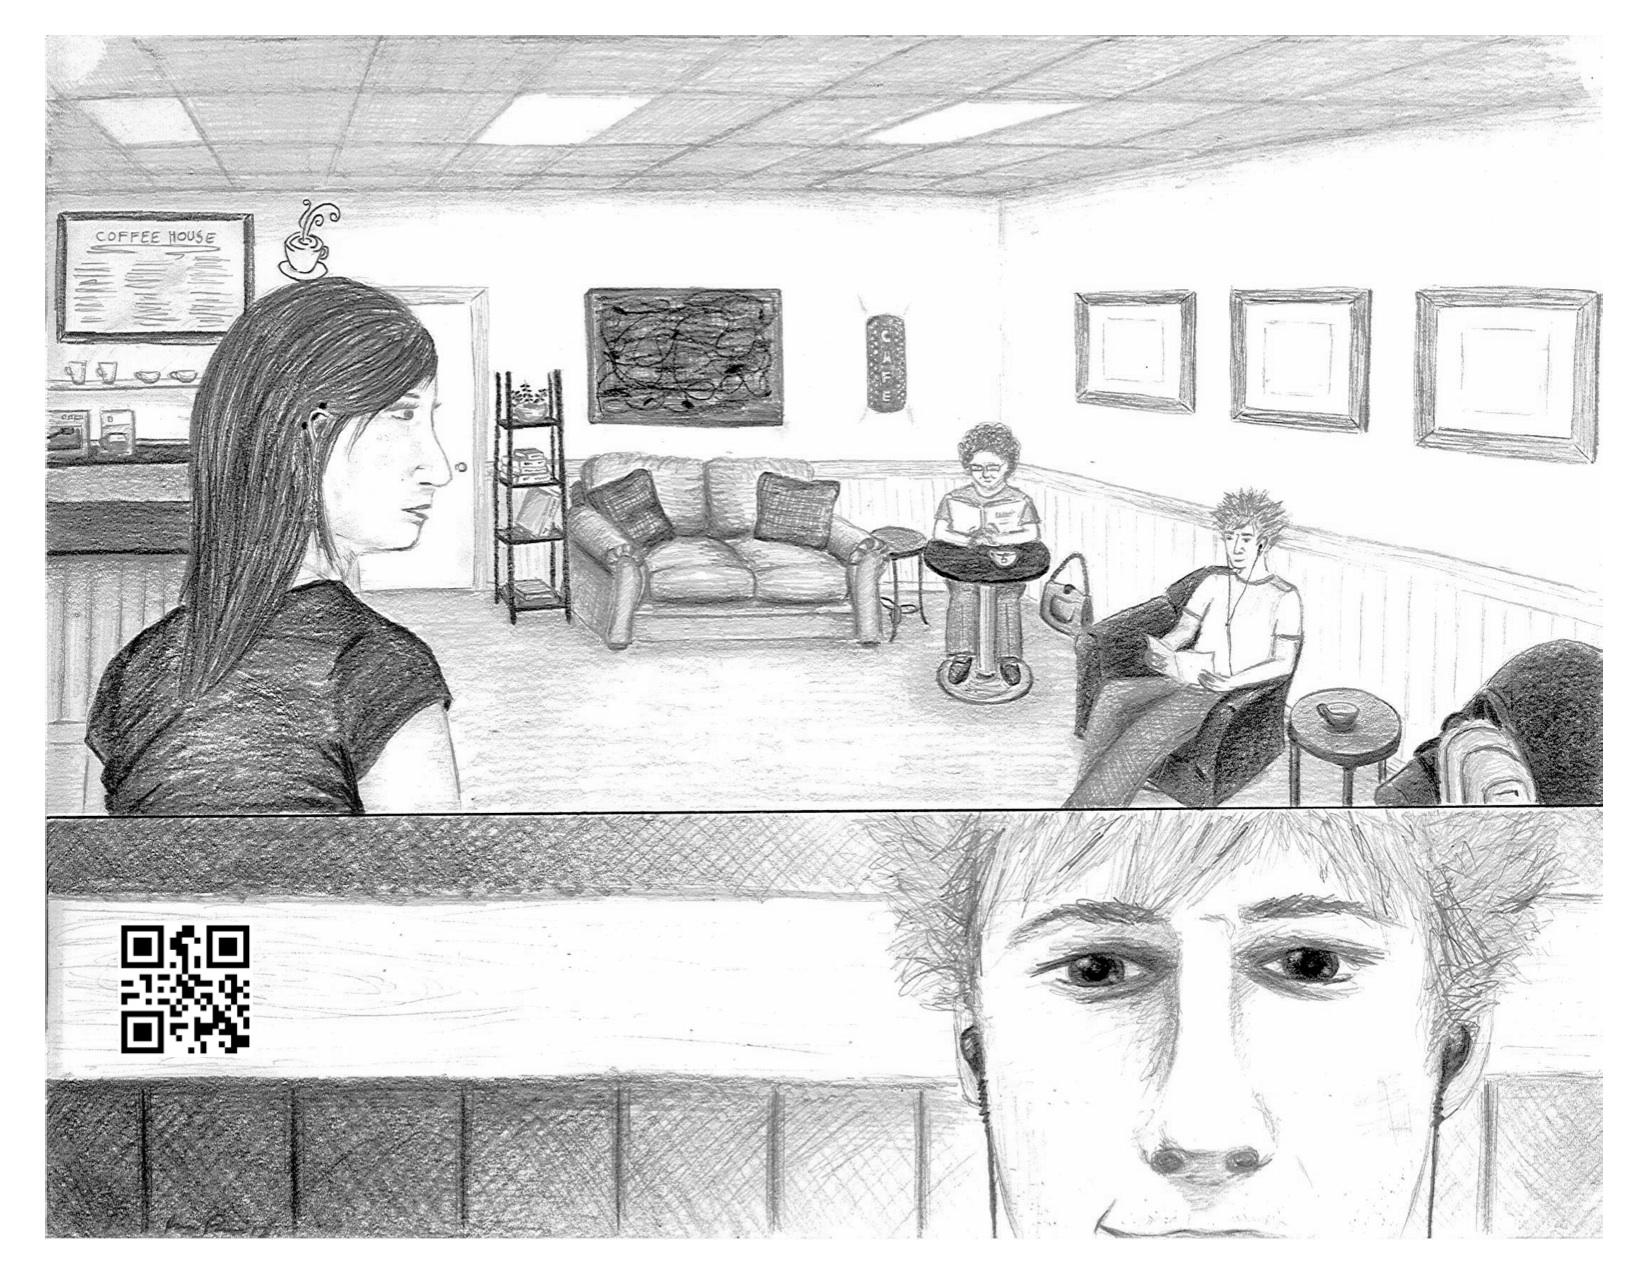 Coffee House Illustration